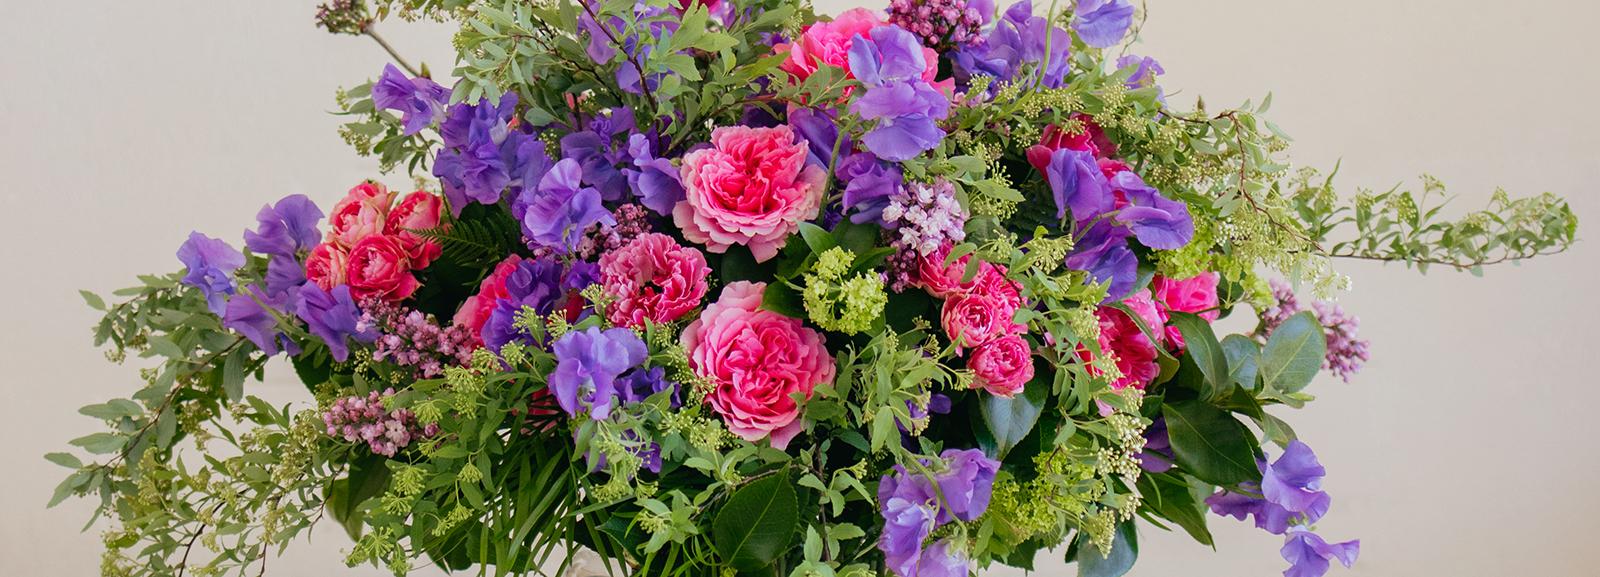 Introducing the Princess Meiko Garden Rose from Alexandra Farms